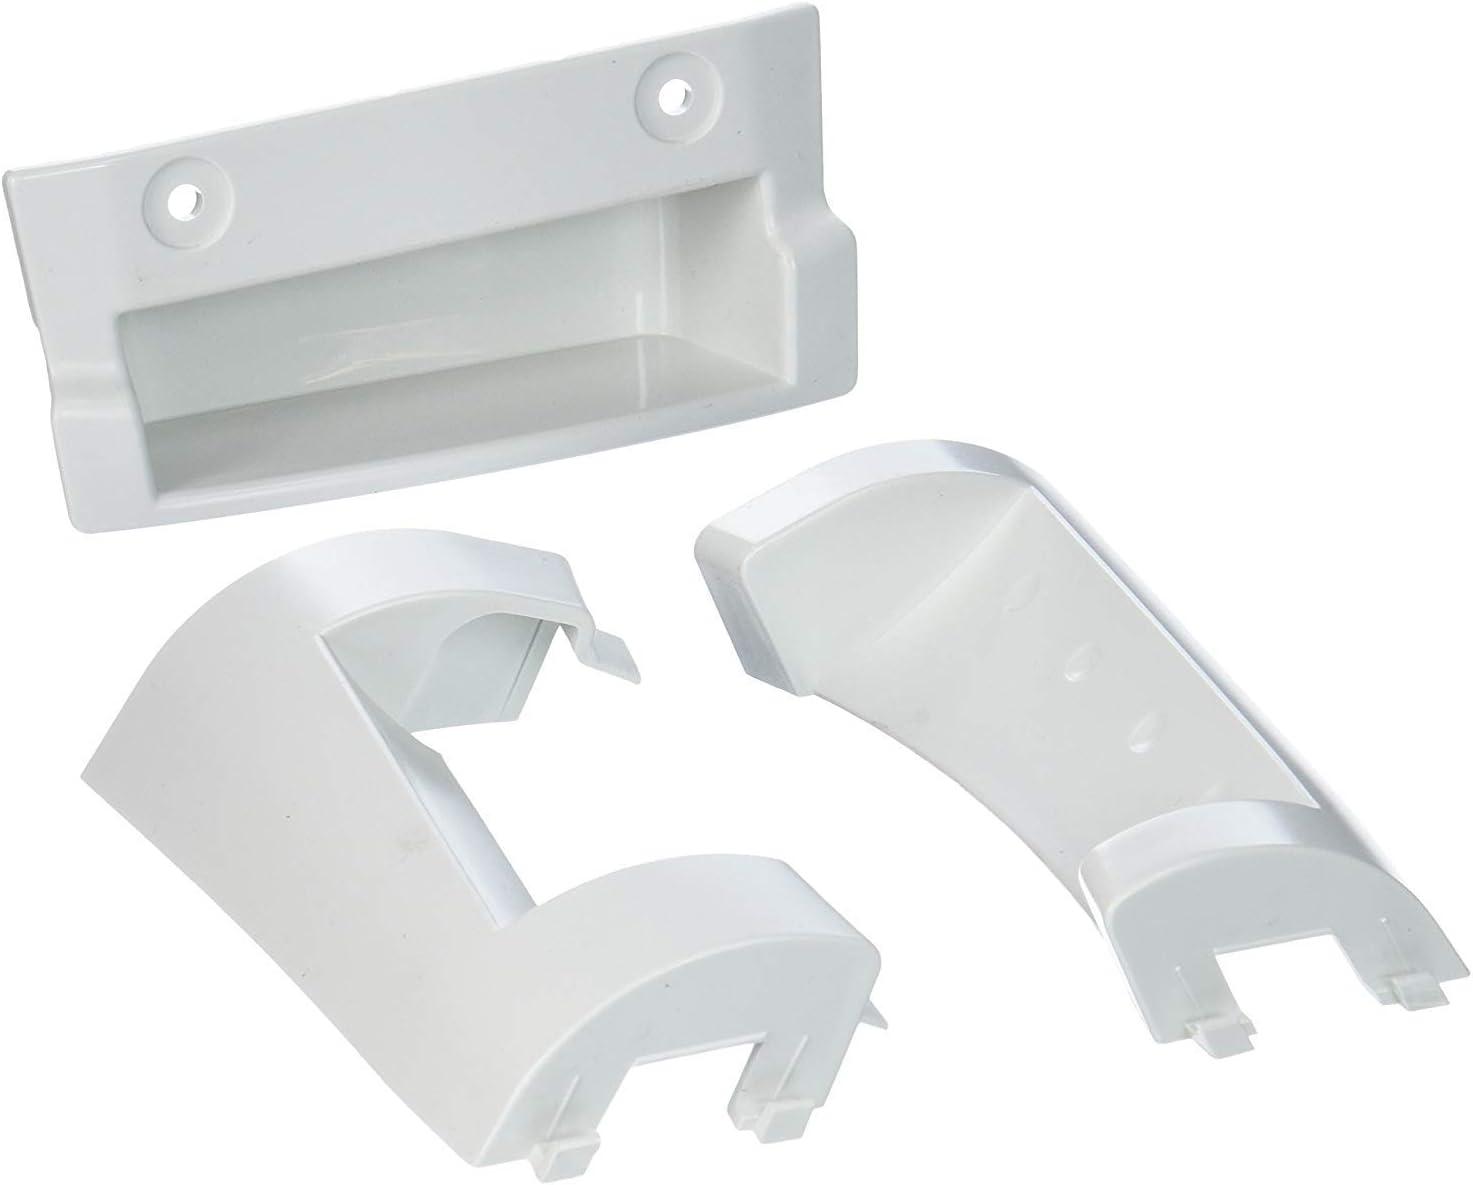 Lifetime Appliance 8530070 Dryer Door Reversal Kit Compatible with Whirlpool Dryer [Upgraded]